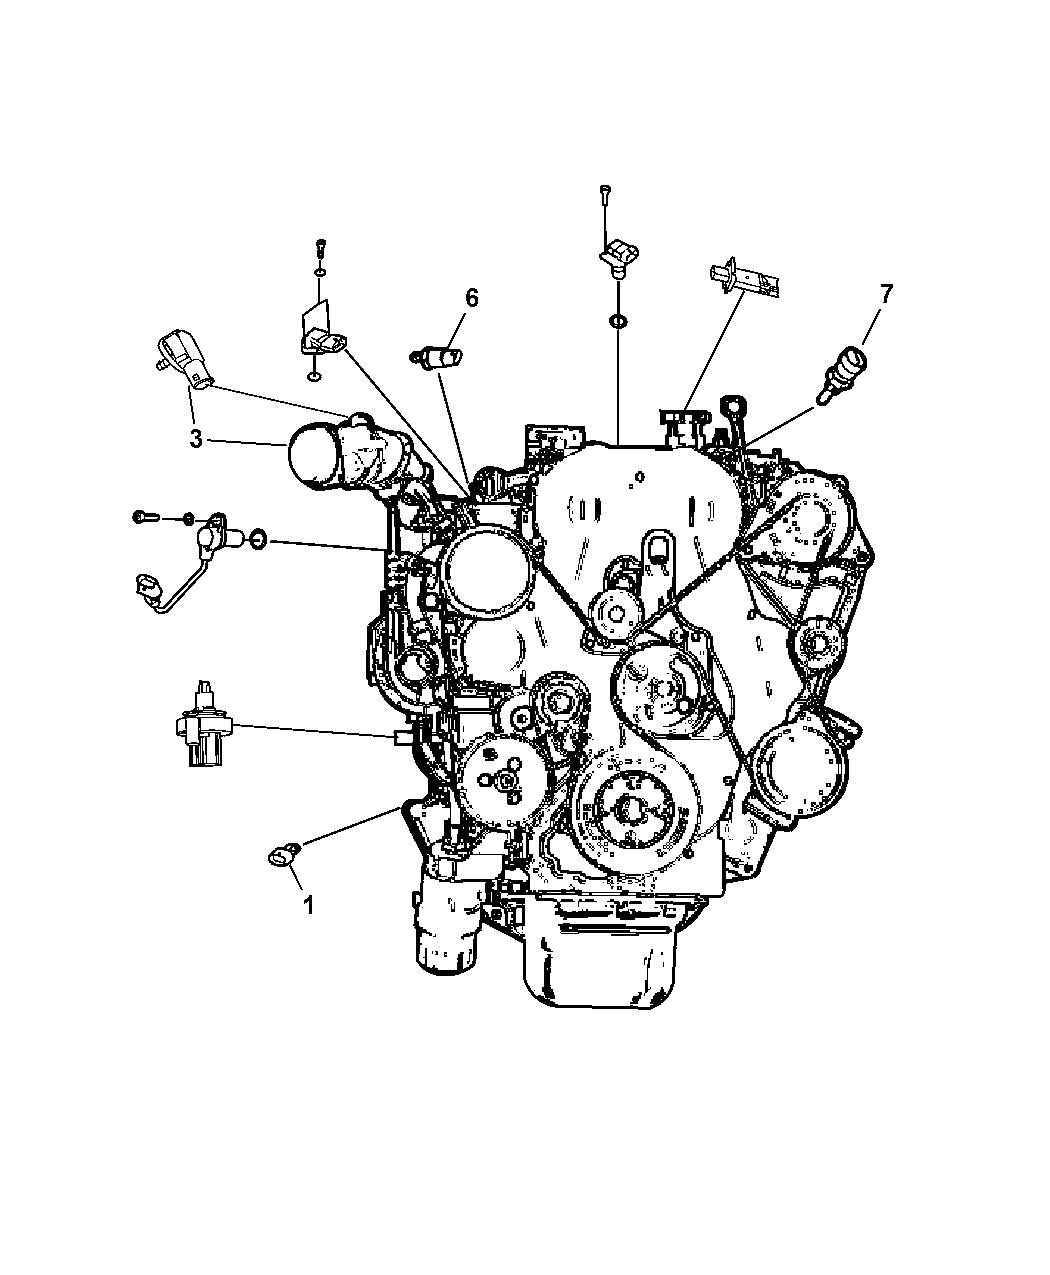 Air Bag Sensor Location Dodge Get Free Image About Wiring Diagram